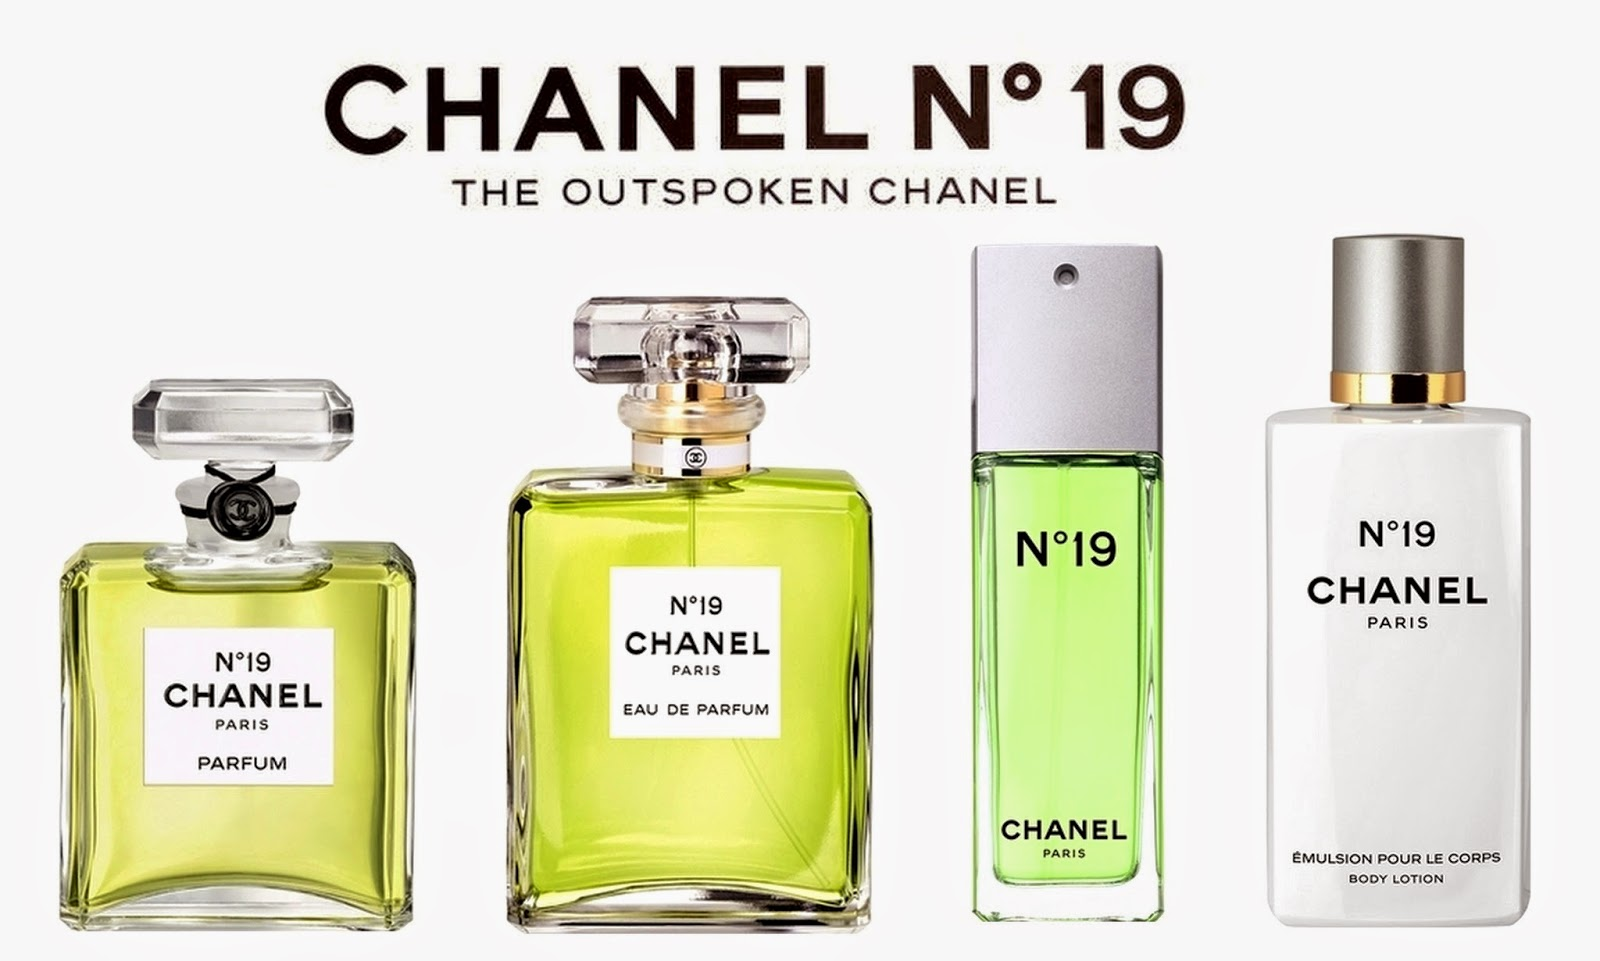 a15237e581 Chanel Perfume Bottles: Chanel No. 19 c1970